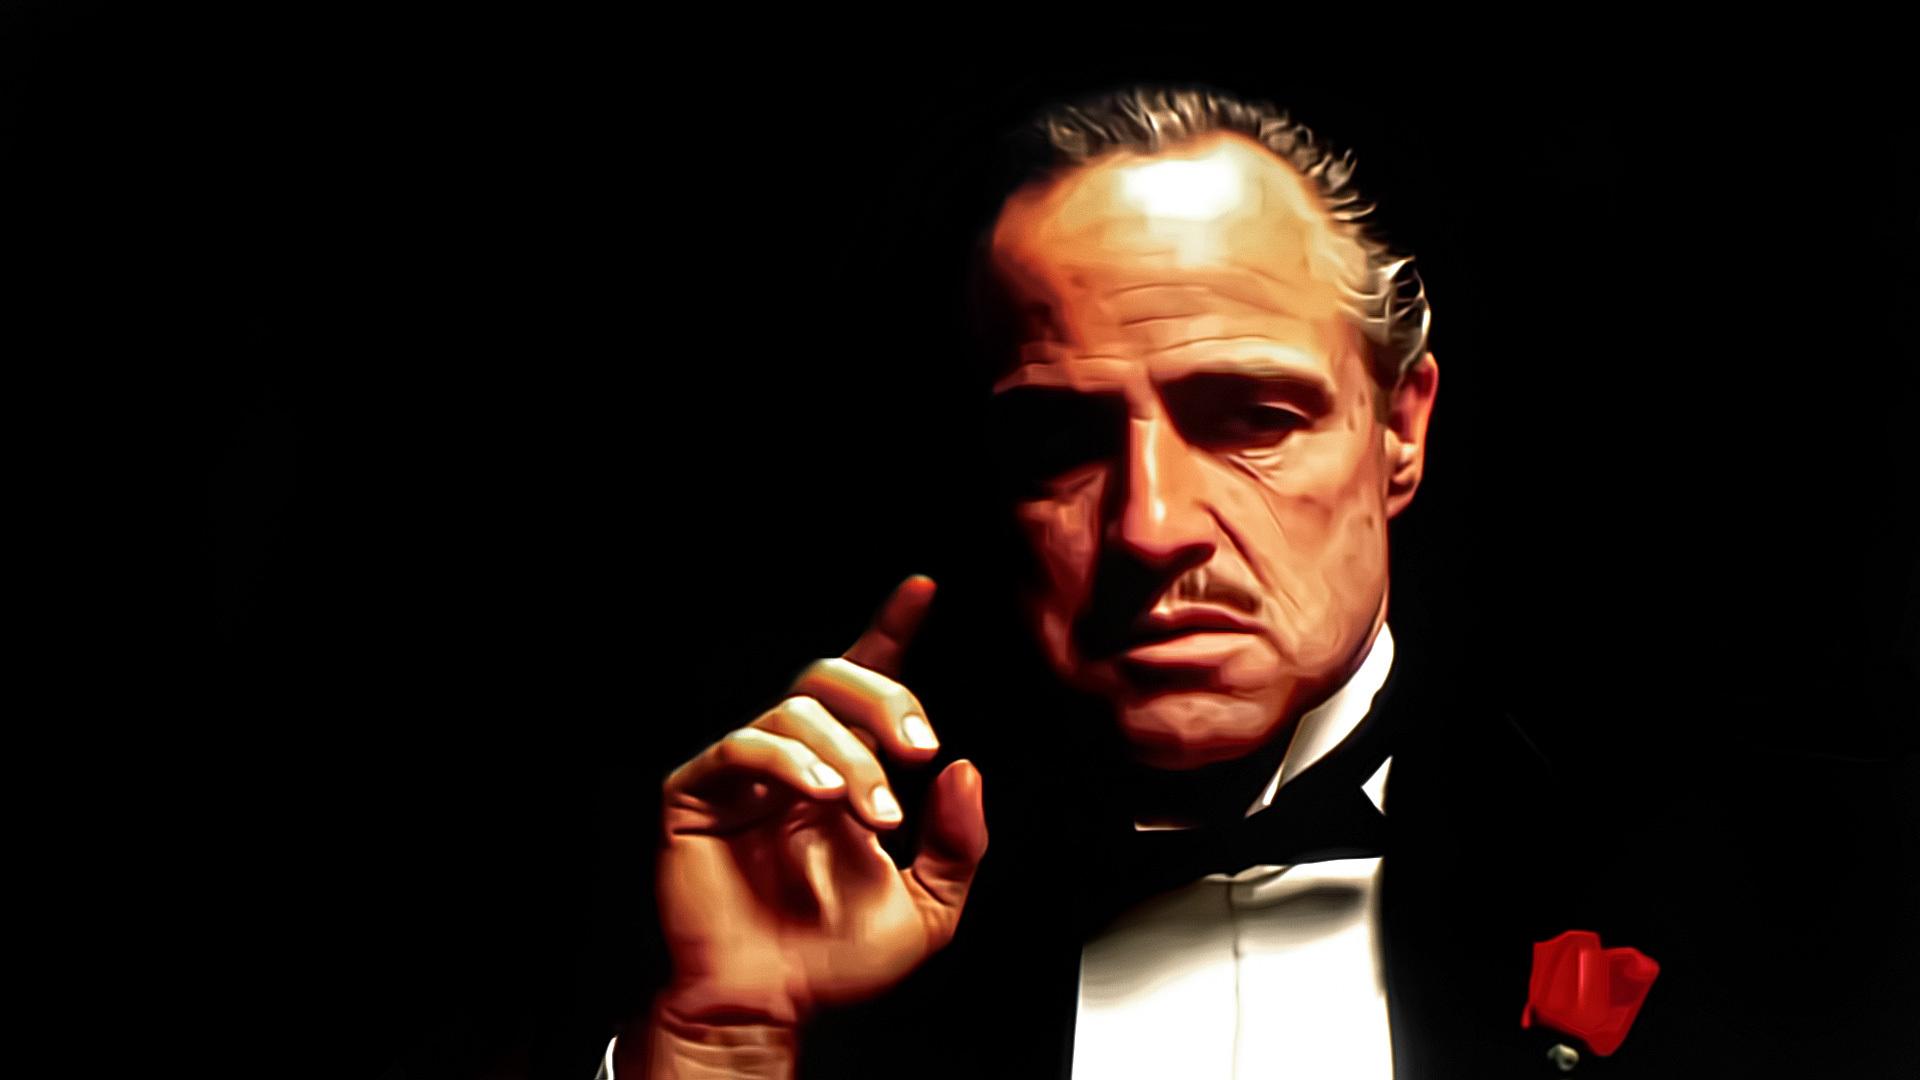 Wallpaper marlon brando godfather godfather don vito corleone 1920x1080